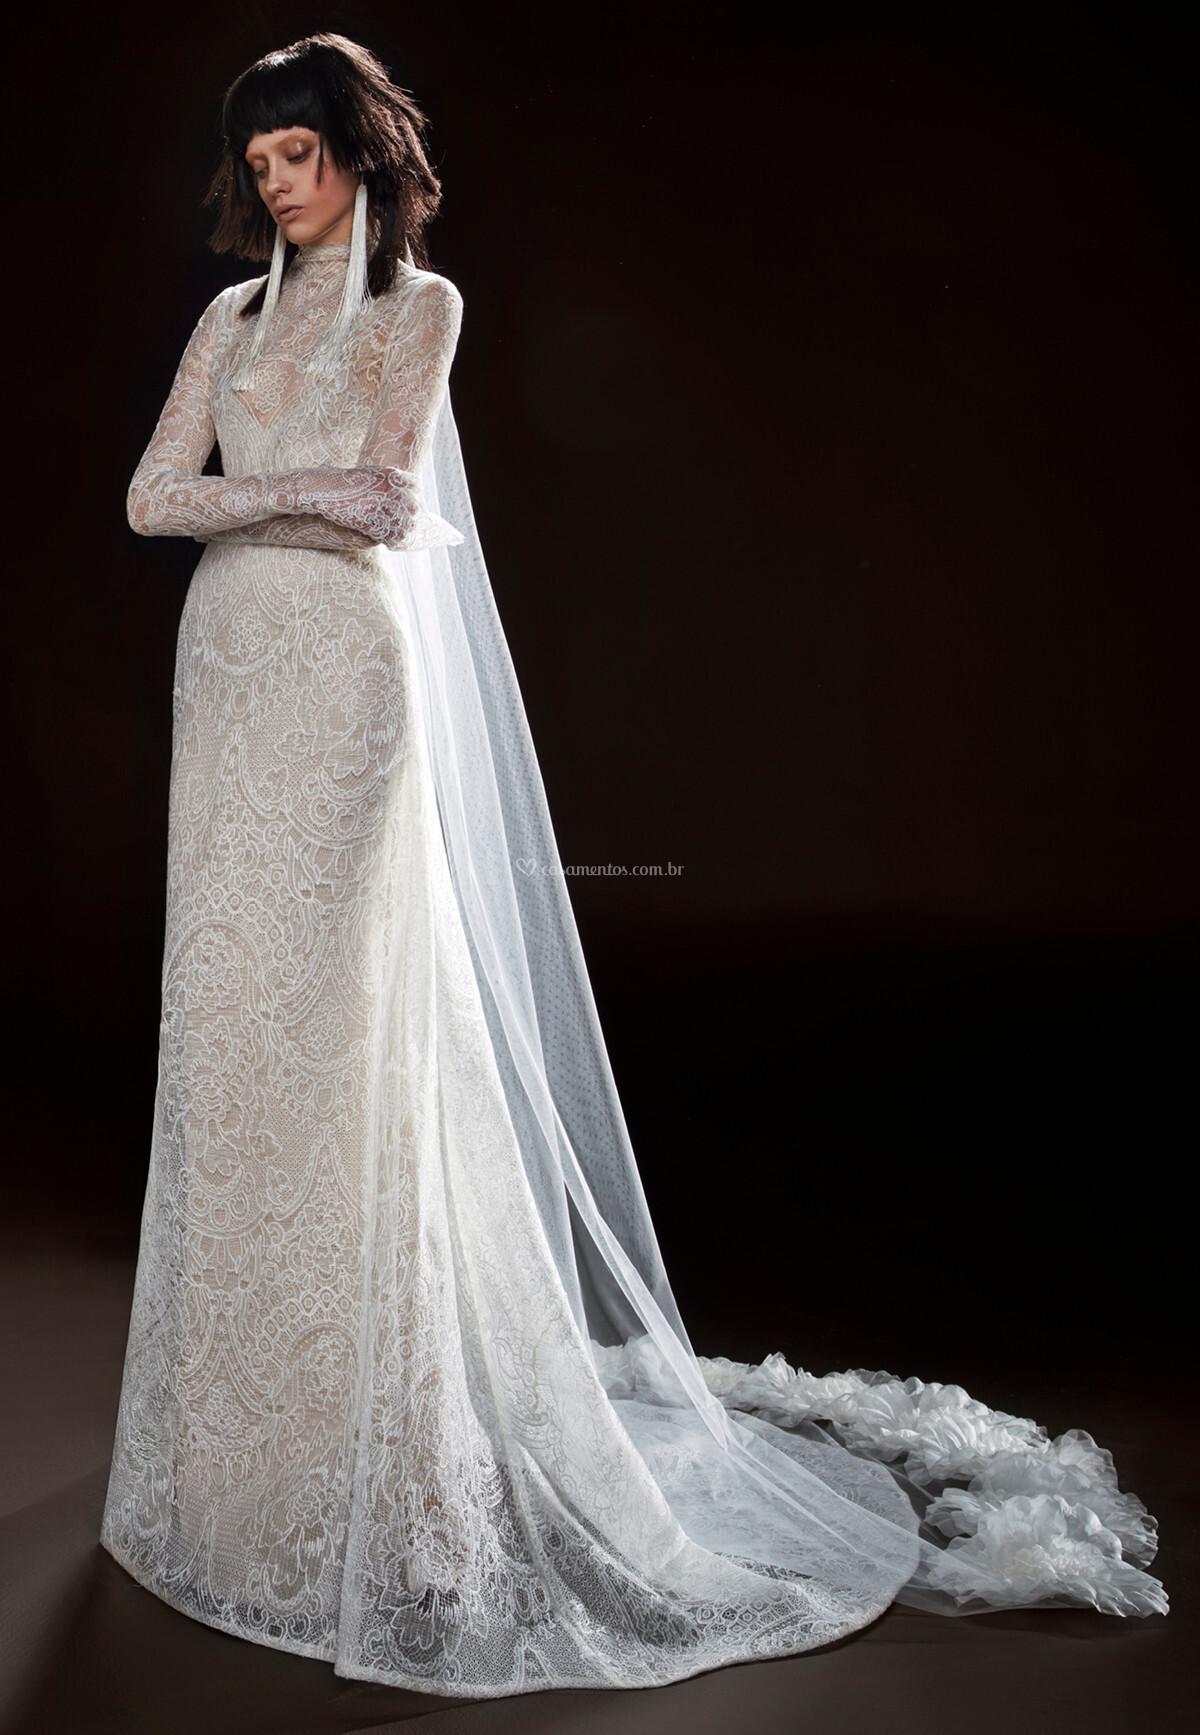 Vestidos de Noivas de Vera Wang - casamentos.com.br